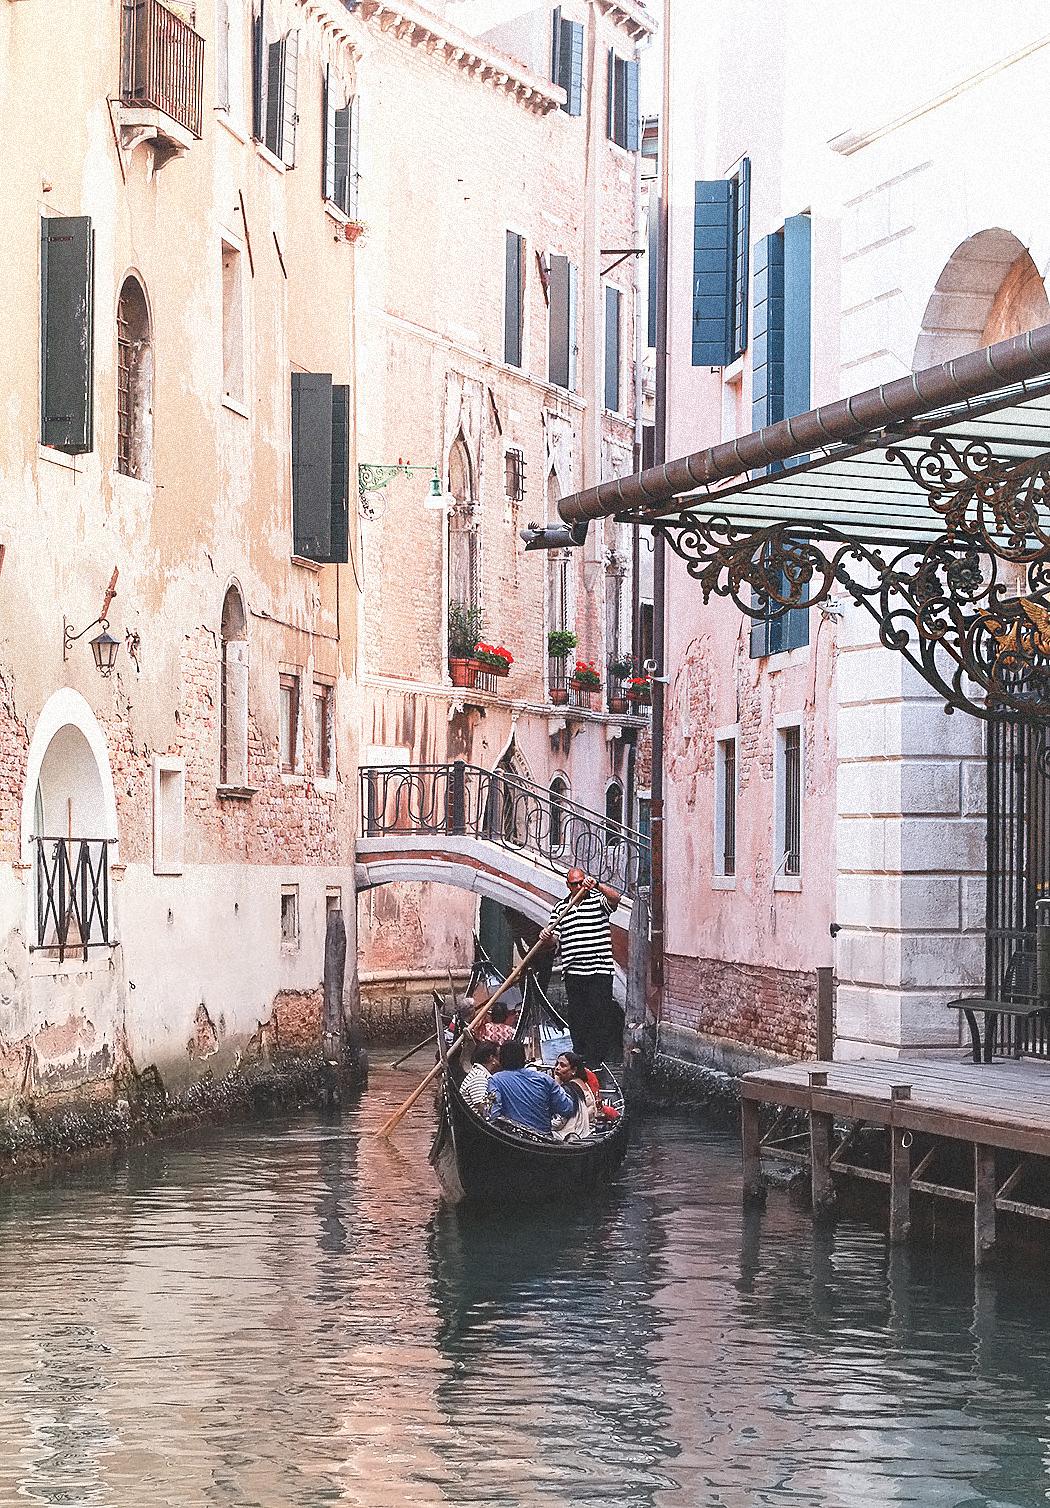 Venezia_travel_blogger_fashion_moscow_ritalifestyle_margarita_maslova_italy_trip_venice_photo_